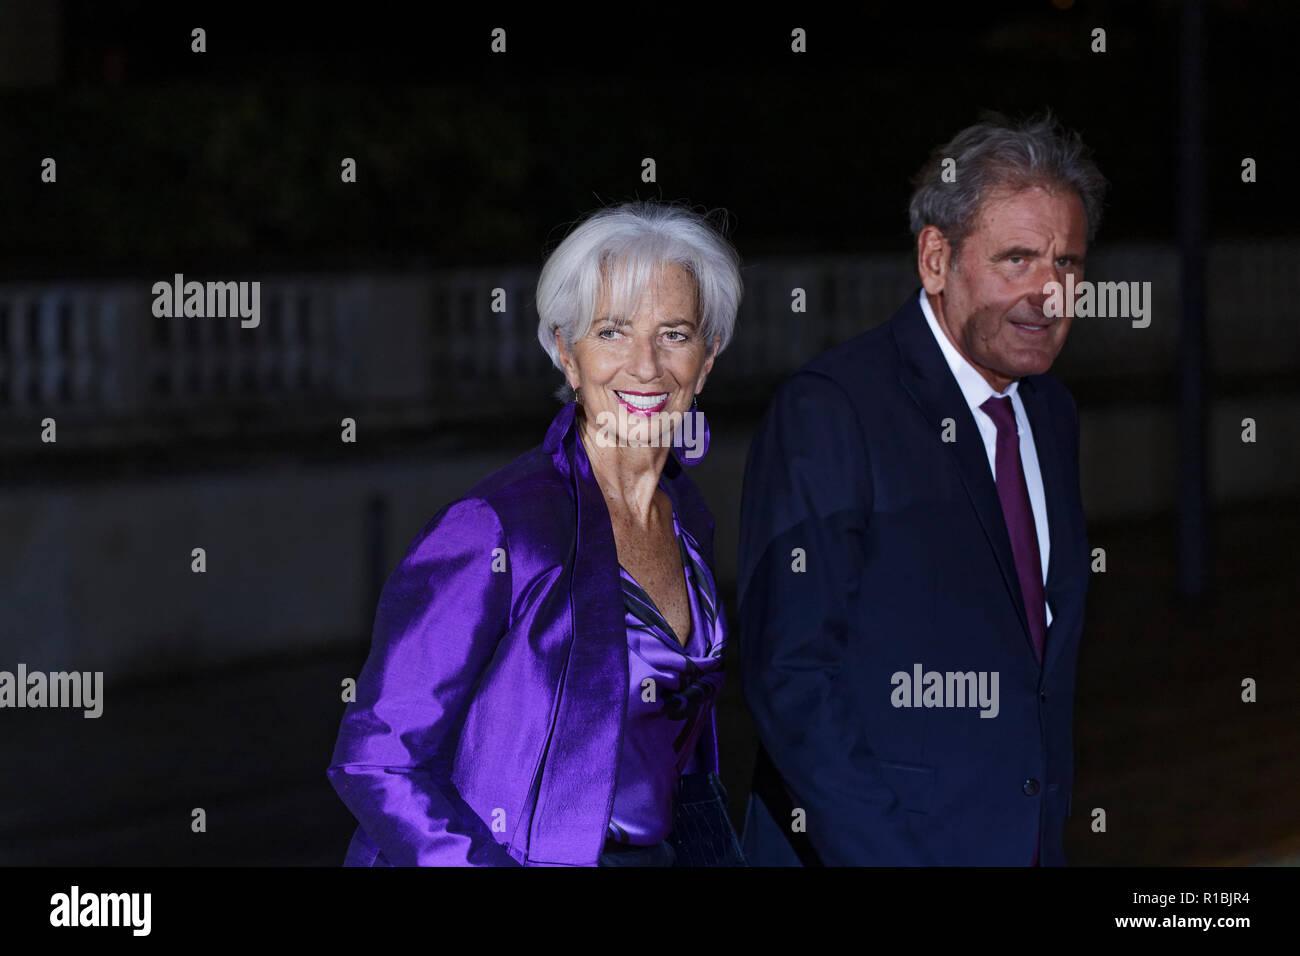 Christine Lagarde Stock Photos & Christine Lagarde Stock